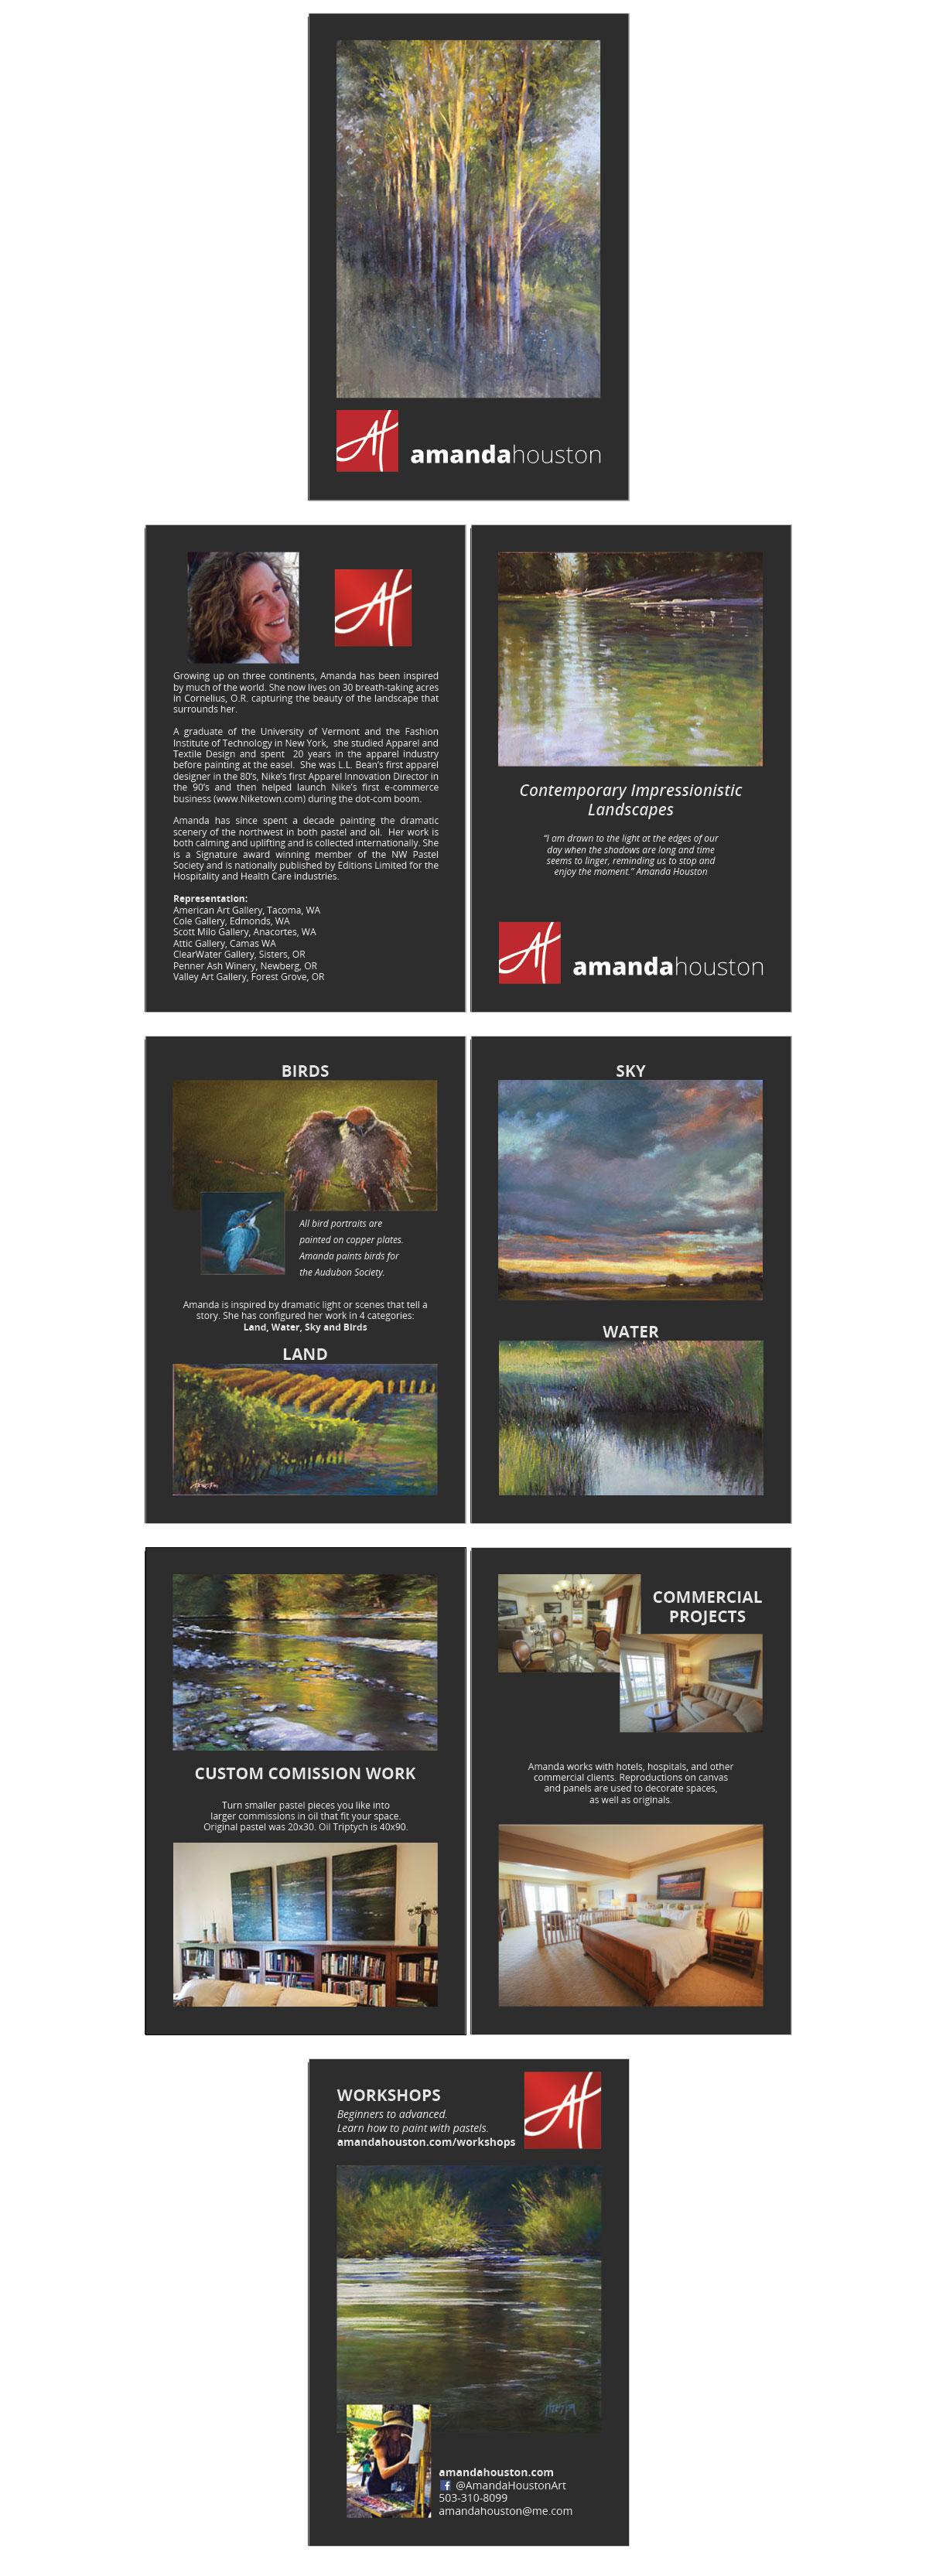 Print Booklet Marketing Materials for Fine Artist Amanda Houston